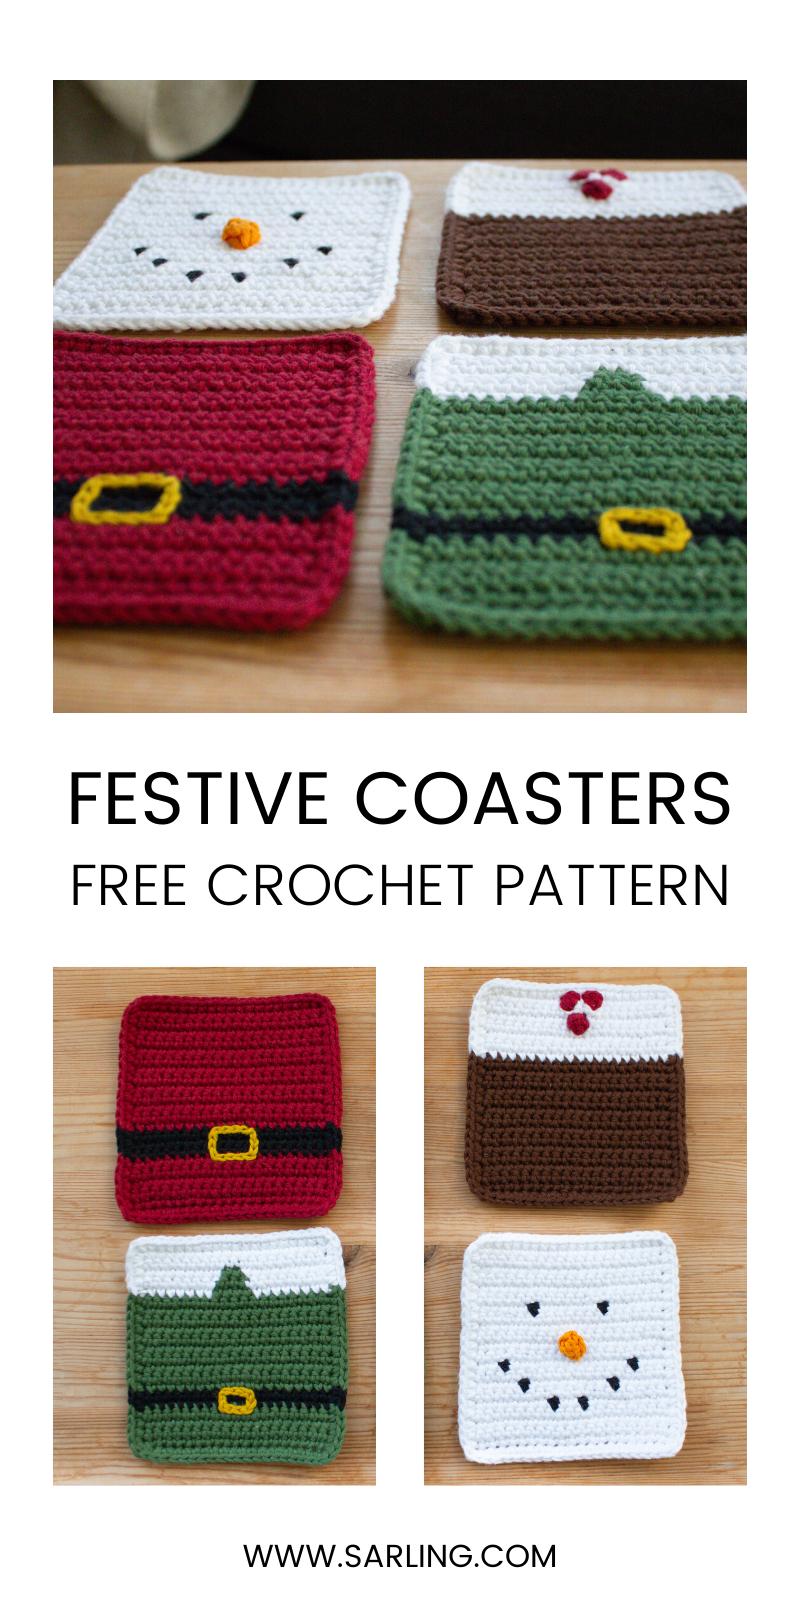 Free Pattern - Crochet Christmas Coasters #crochetcrafts